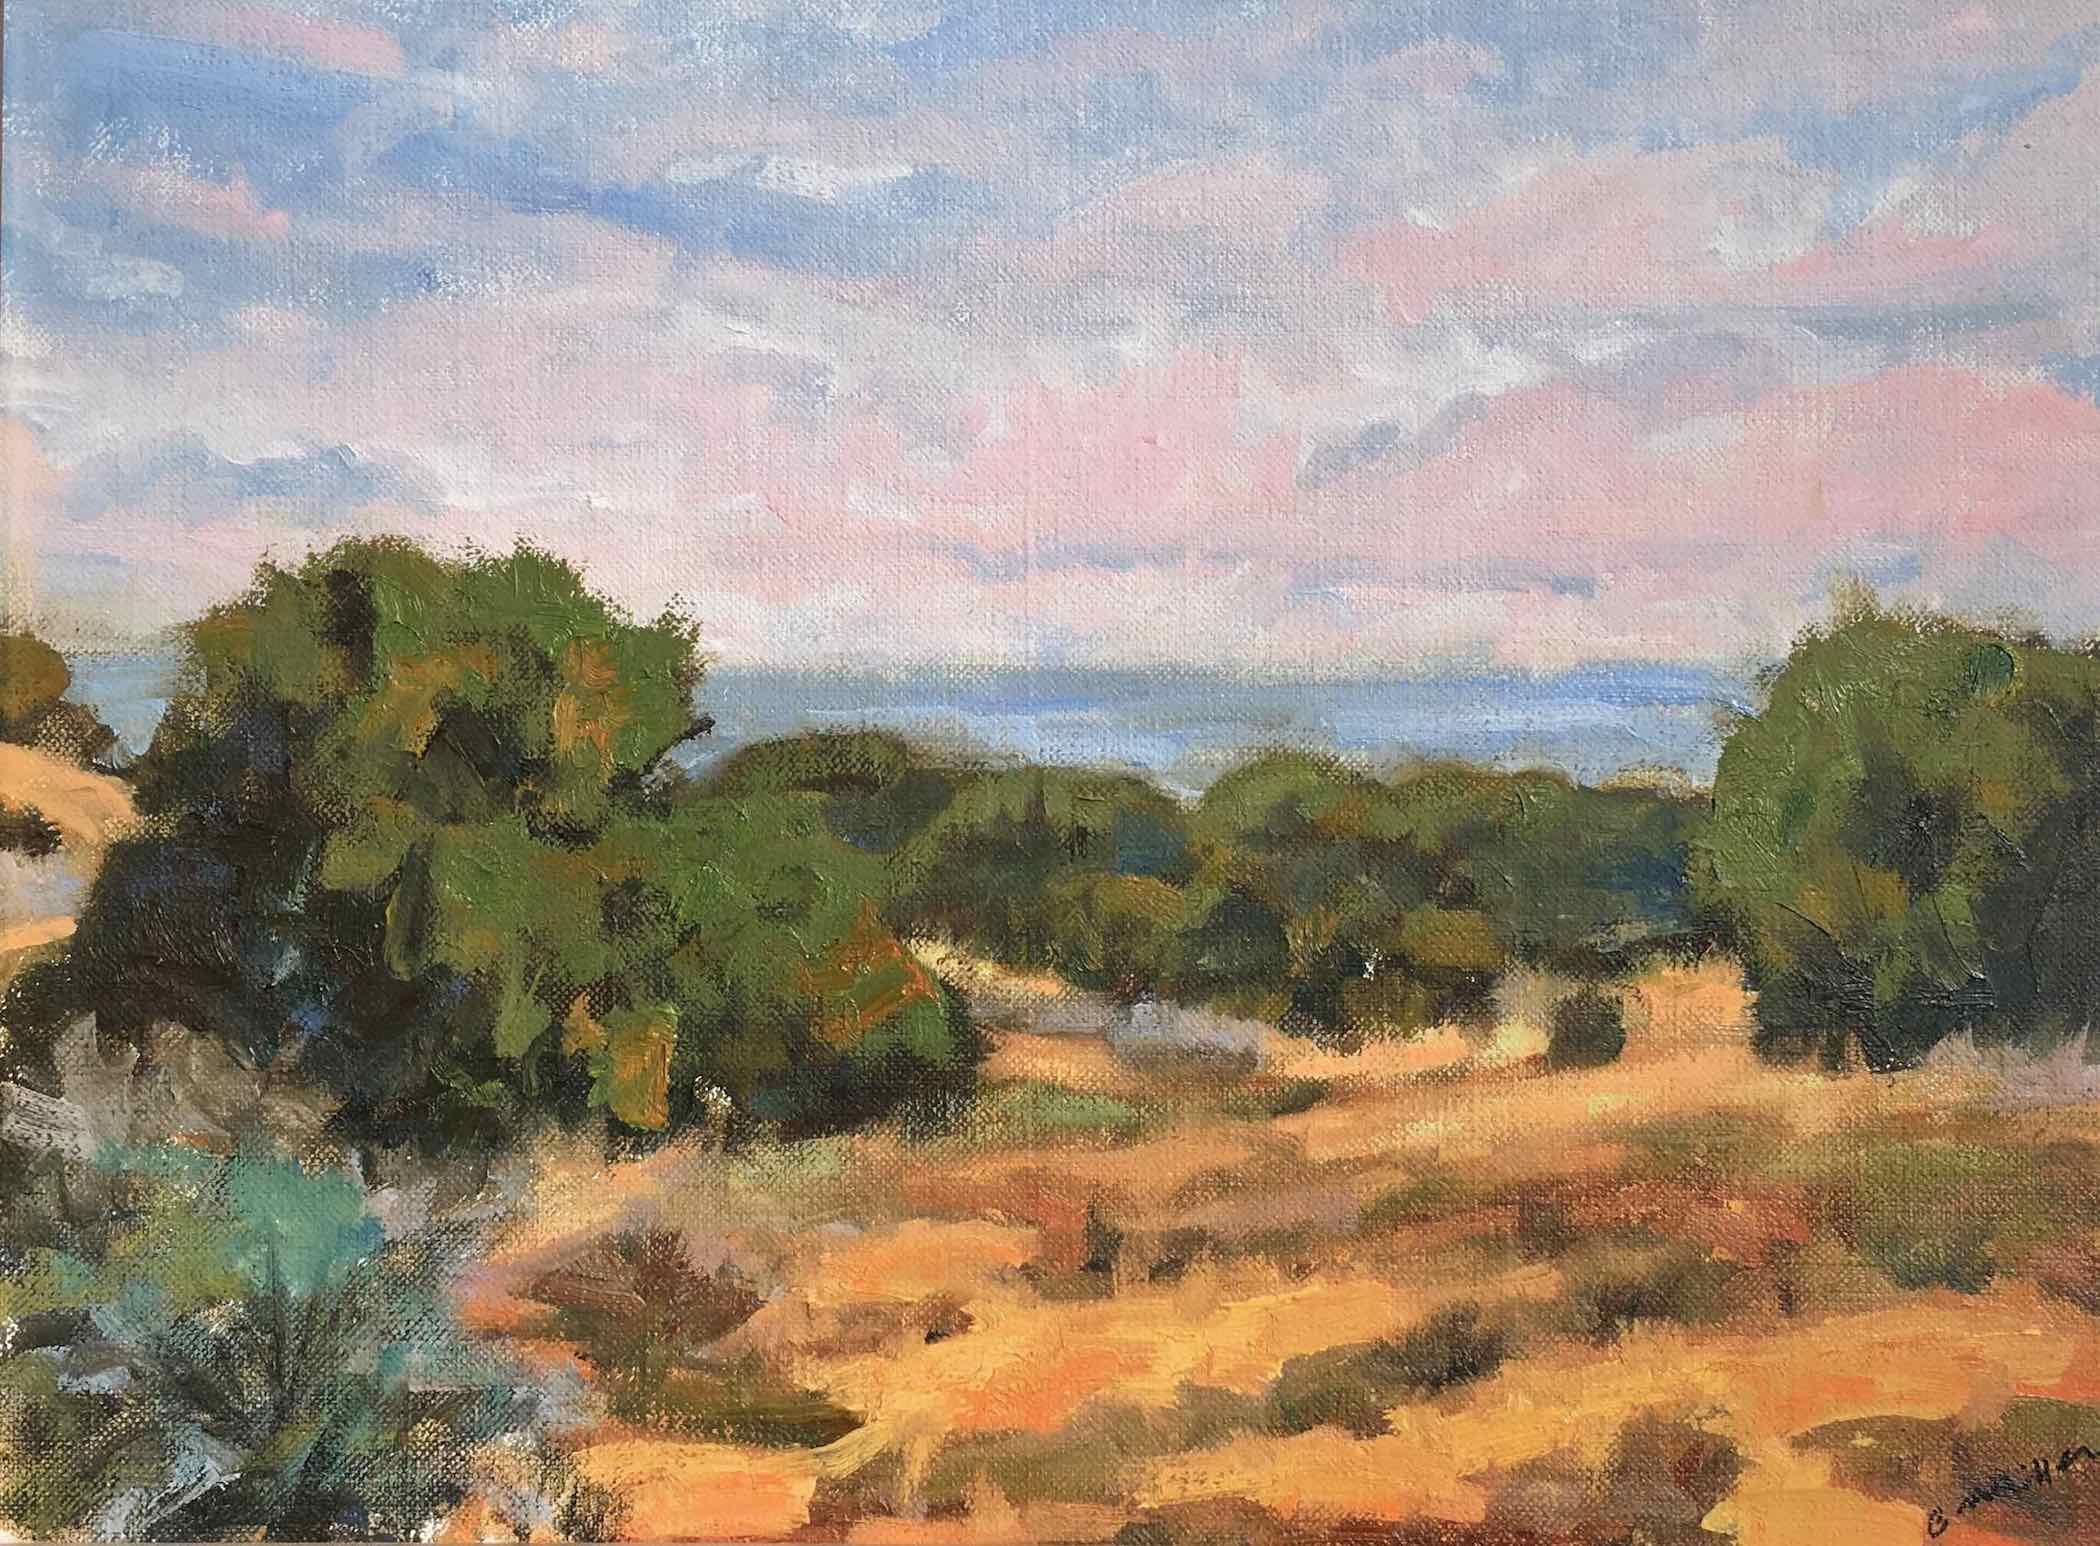 Chris Miller: Sandia Mountains Foothills